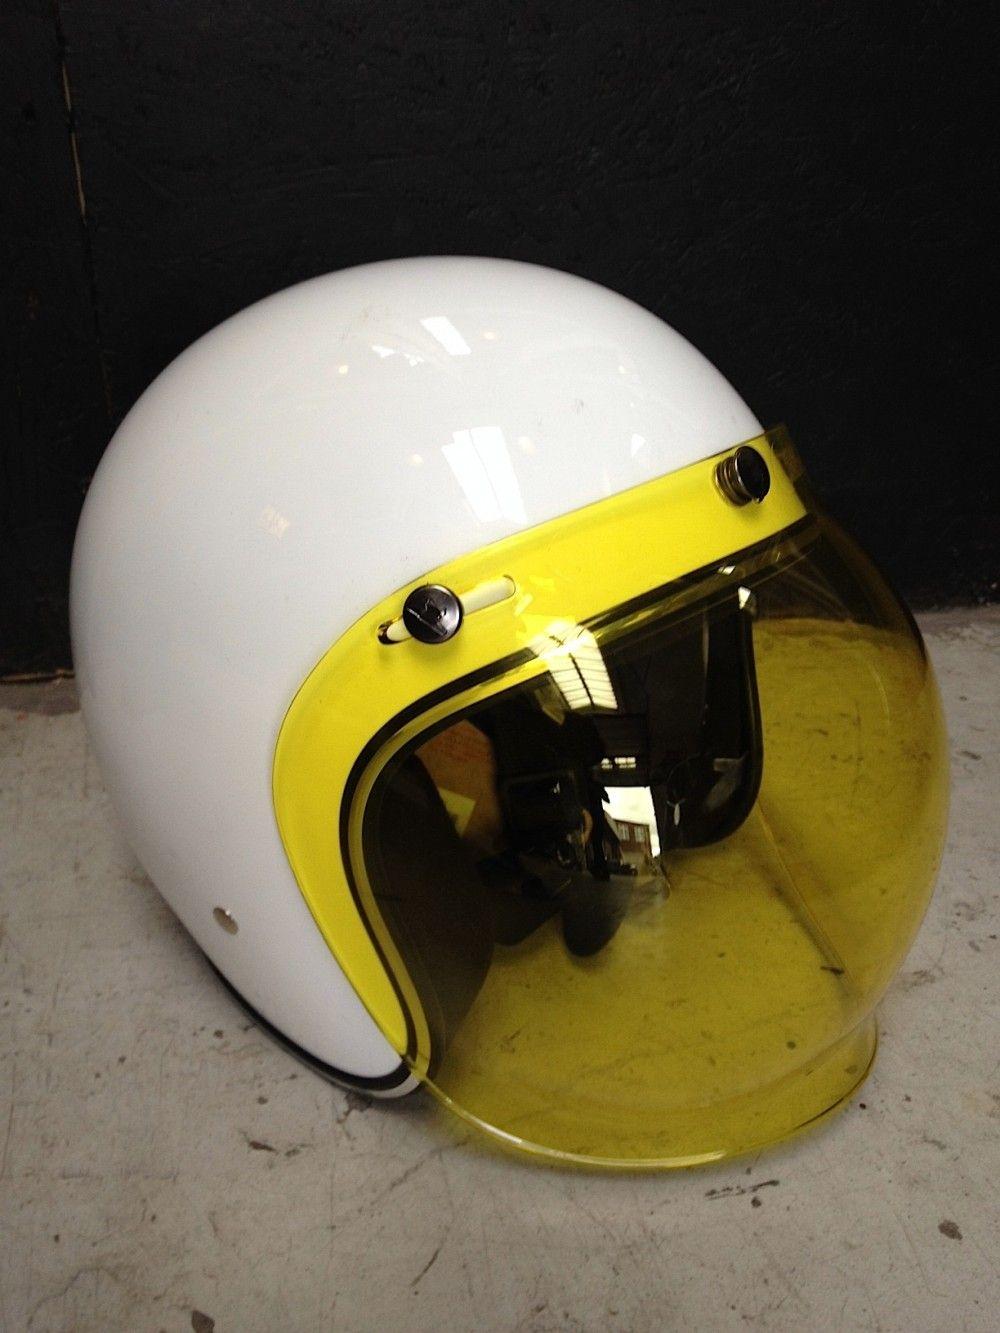 Helmet W Bubble Shield This Is The Look Rinsing On The Lambretta Silver Special Women Helmet Helmet Paint Helmet